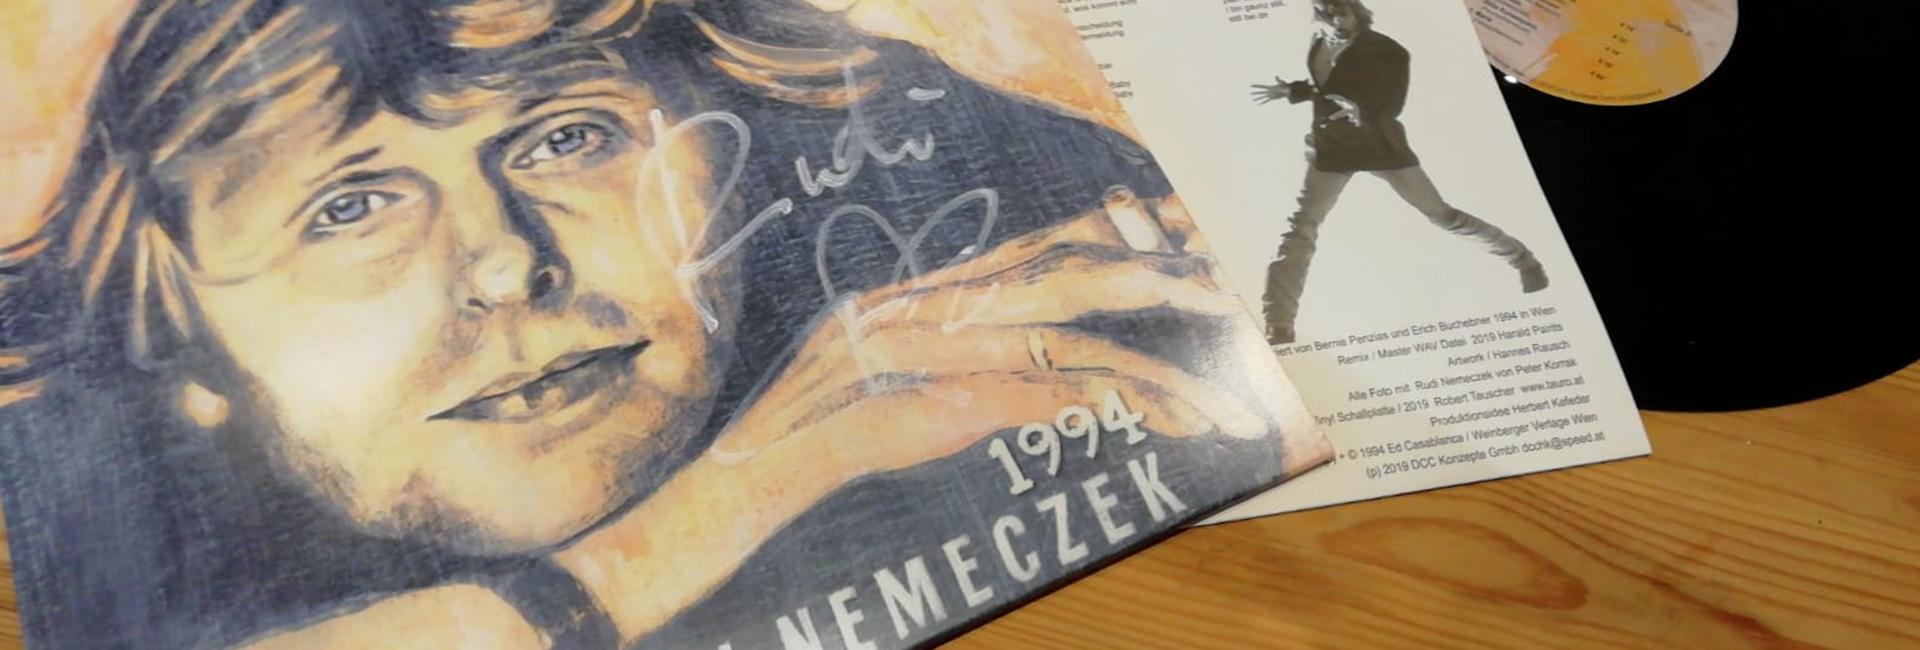 Rudi Nemeczek